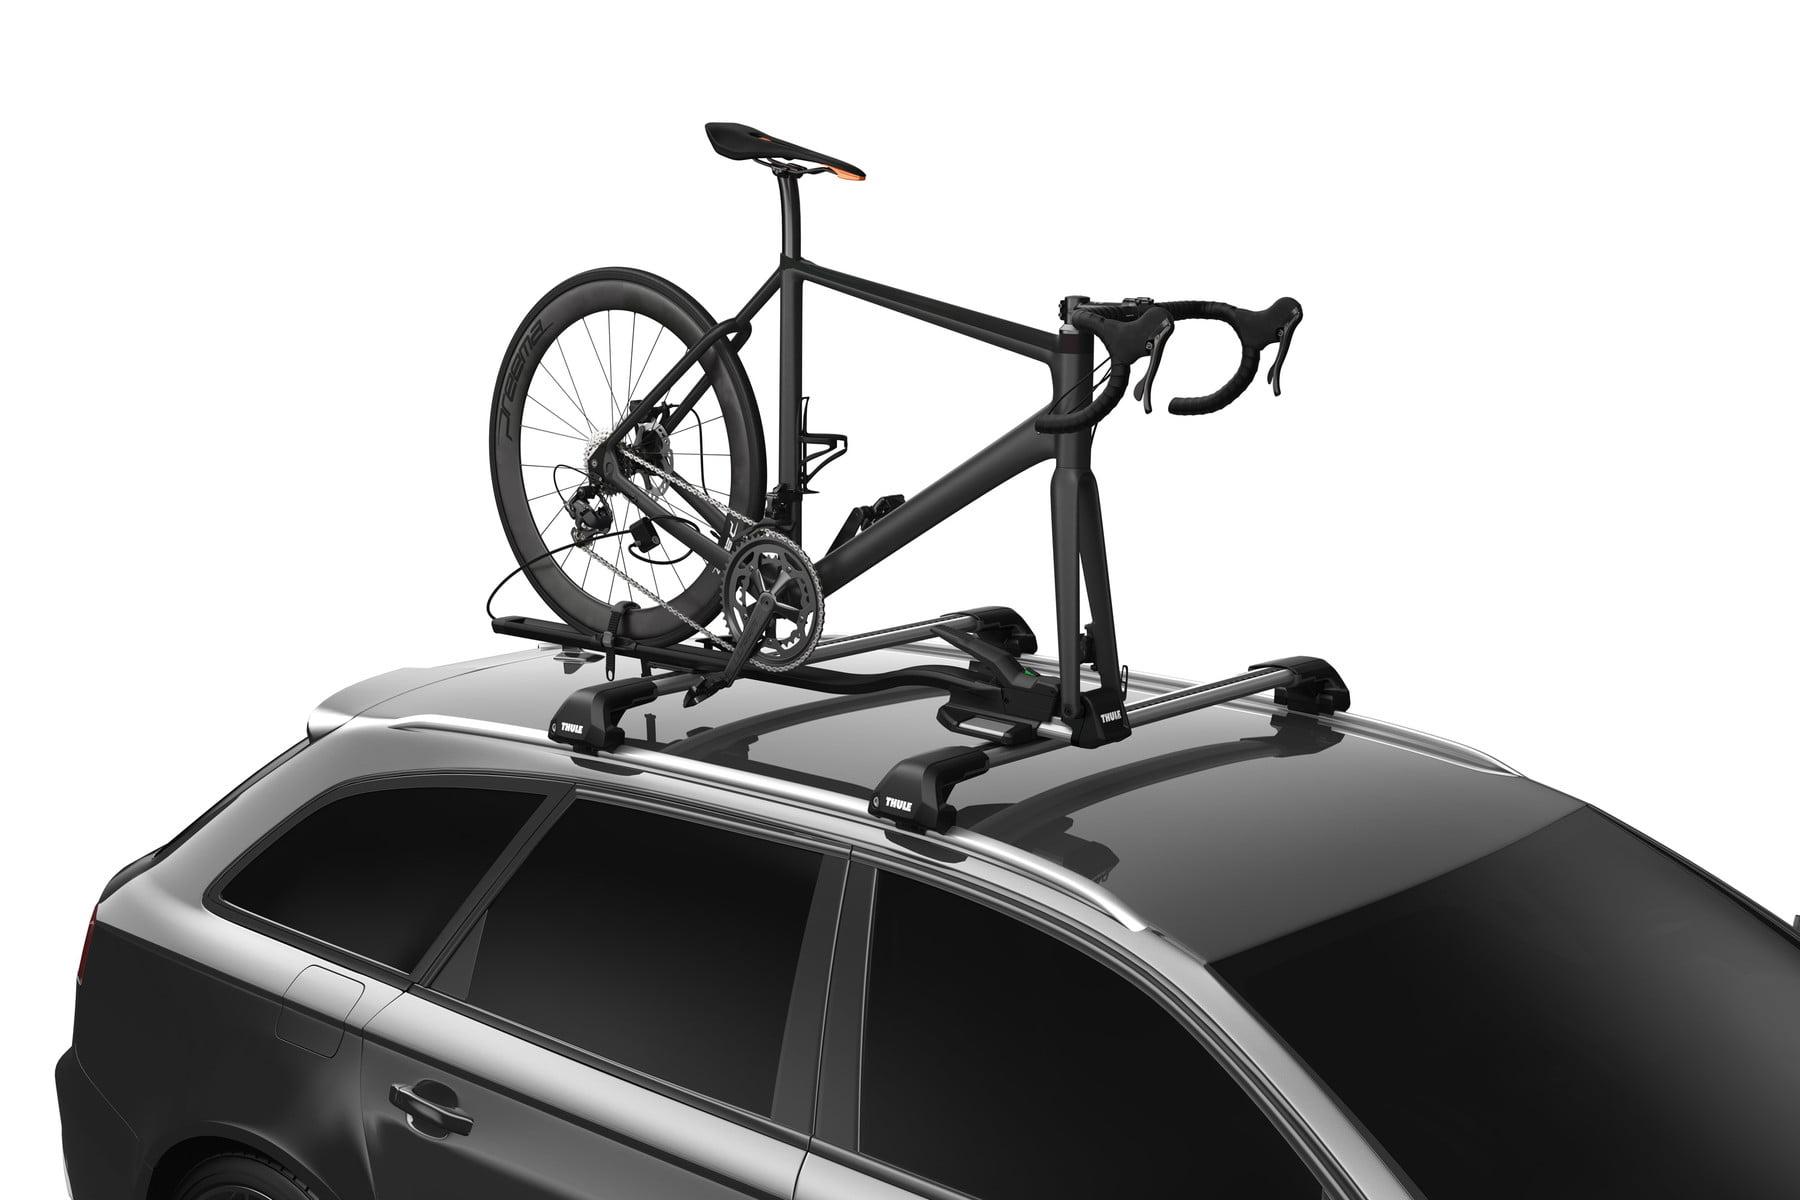 Suport biciclete Thule TopRide cu prindere pe bare transversale 5